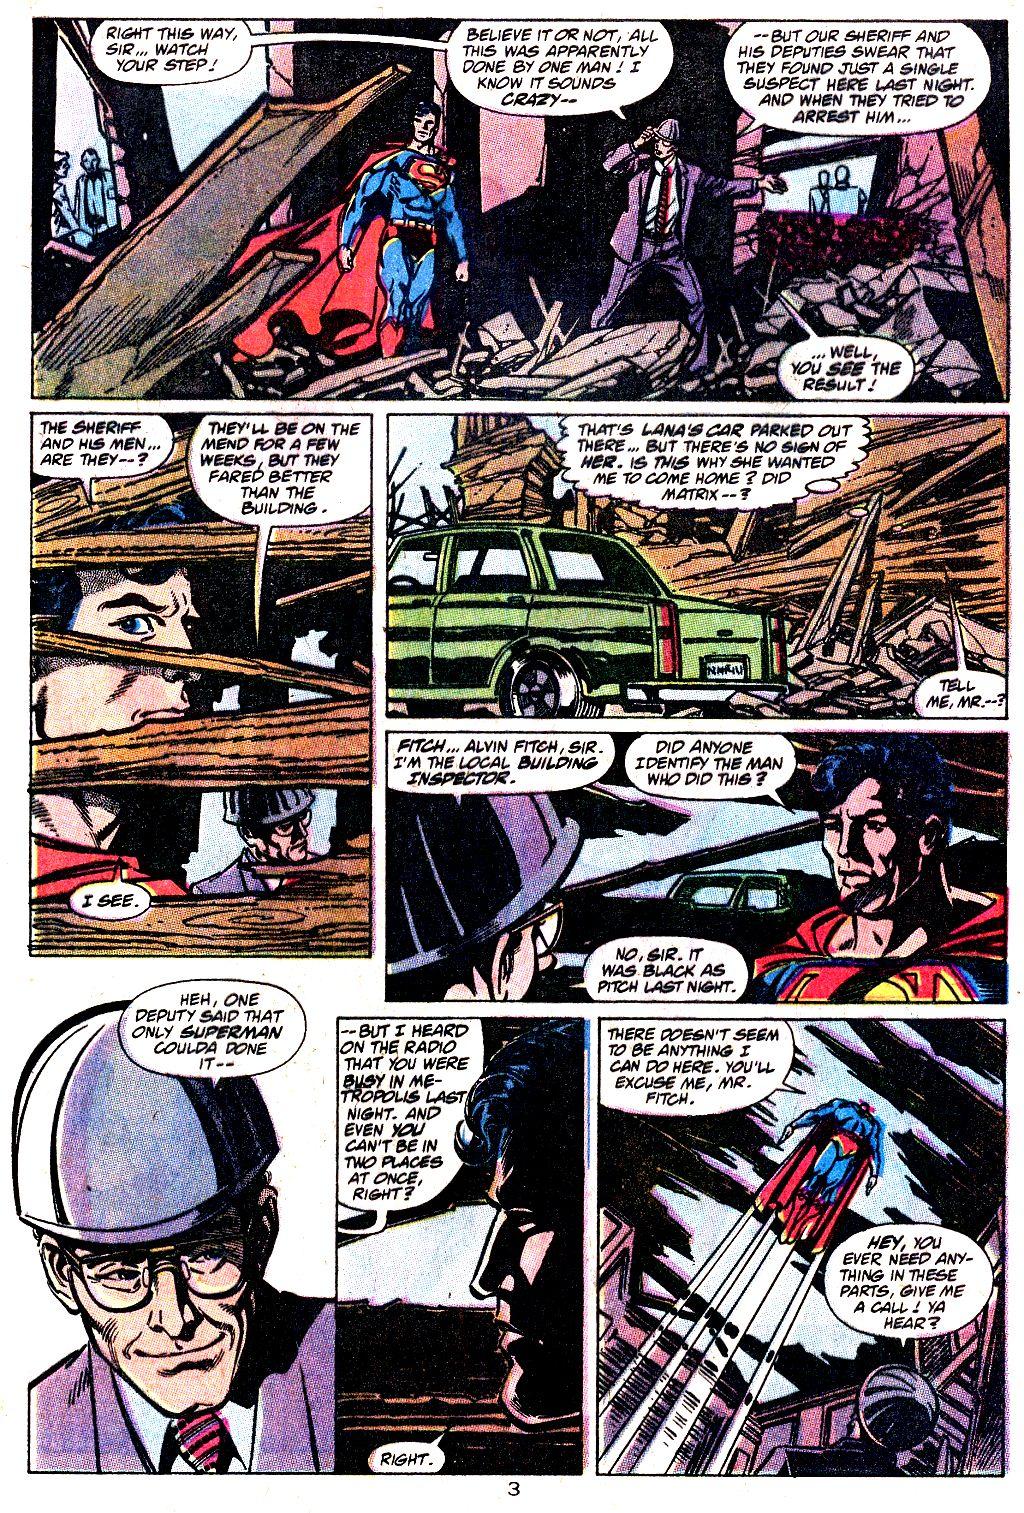 Action Comics (1938) 644 Page 3